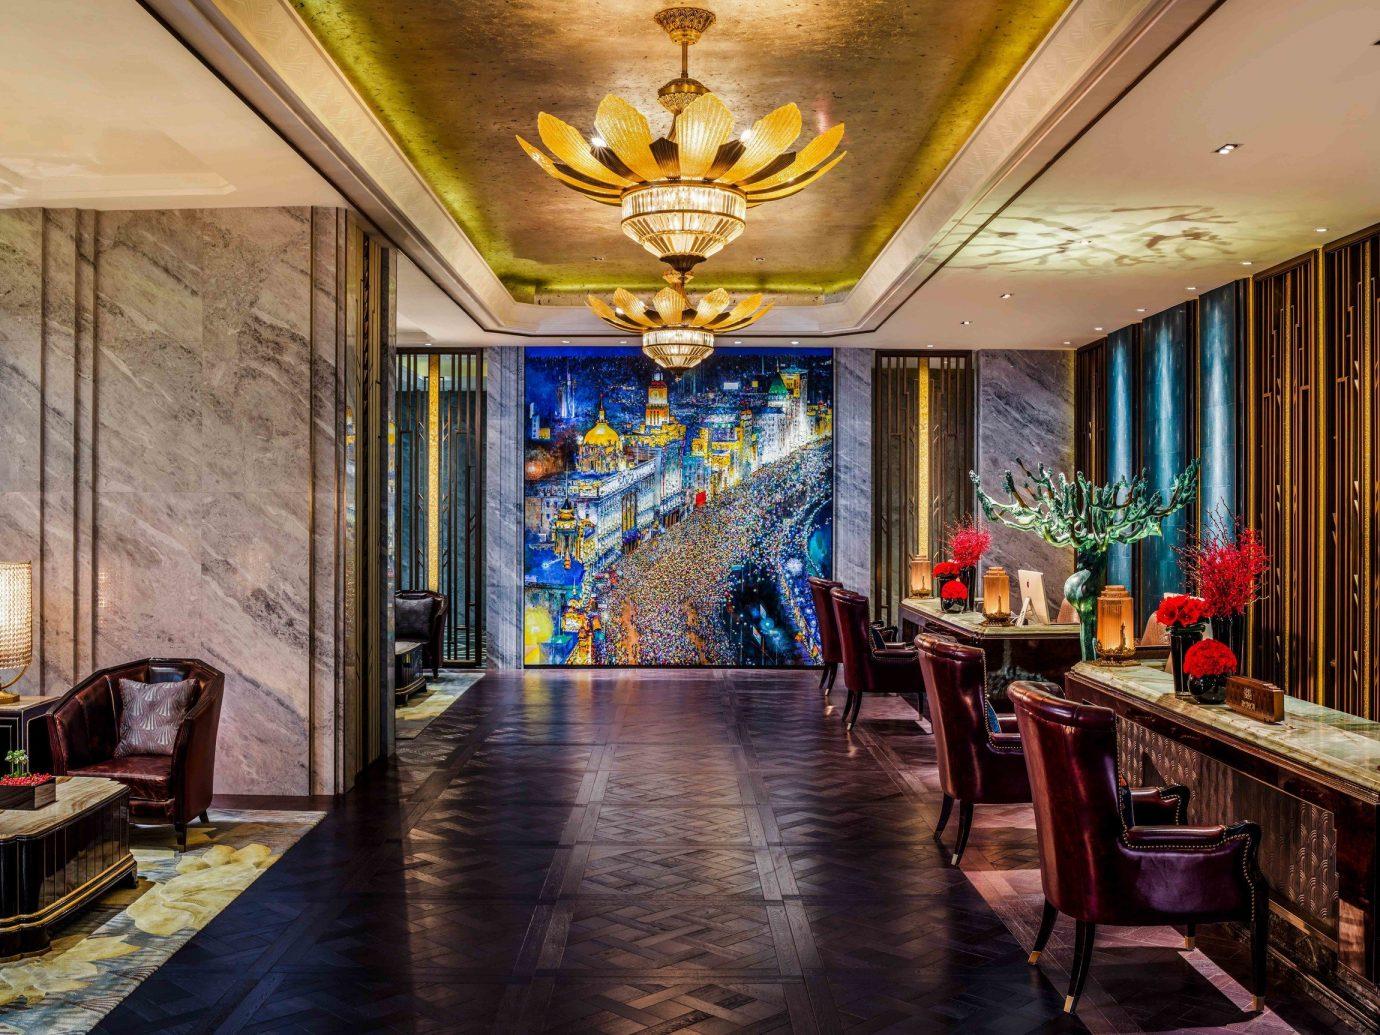 Boutique Hotels Luxury Travel indoor floor ceiling room interior design Lobby window living room real estate hall furniture